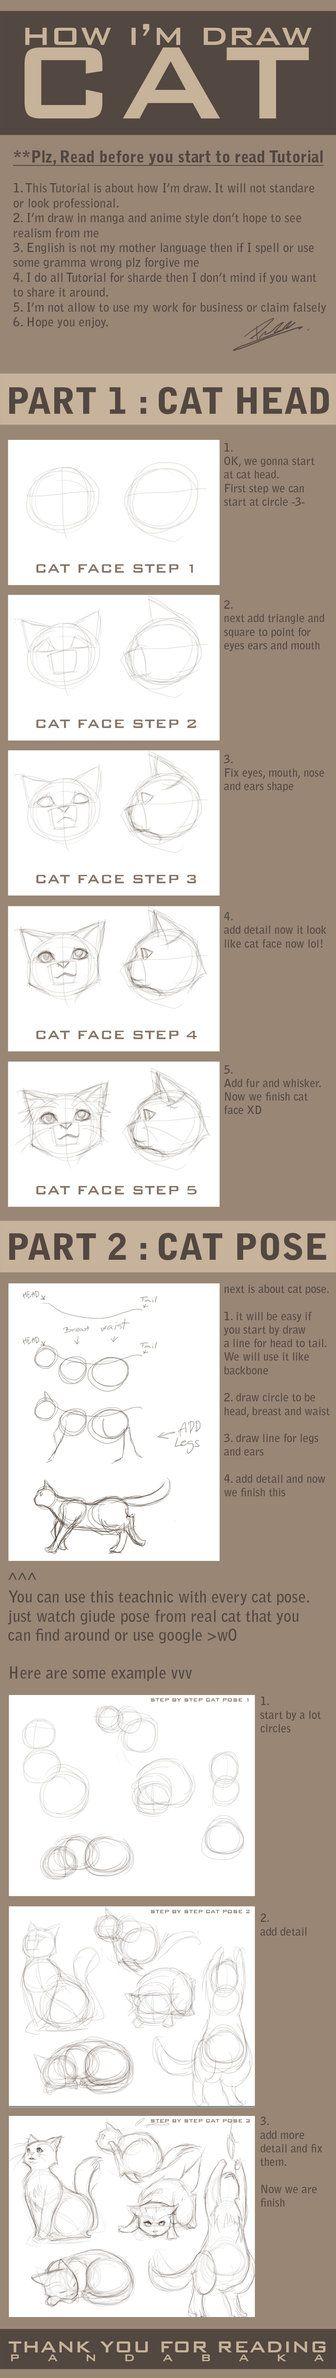 how I am draw cat by pandabaka on deviantART